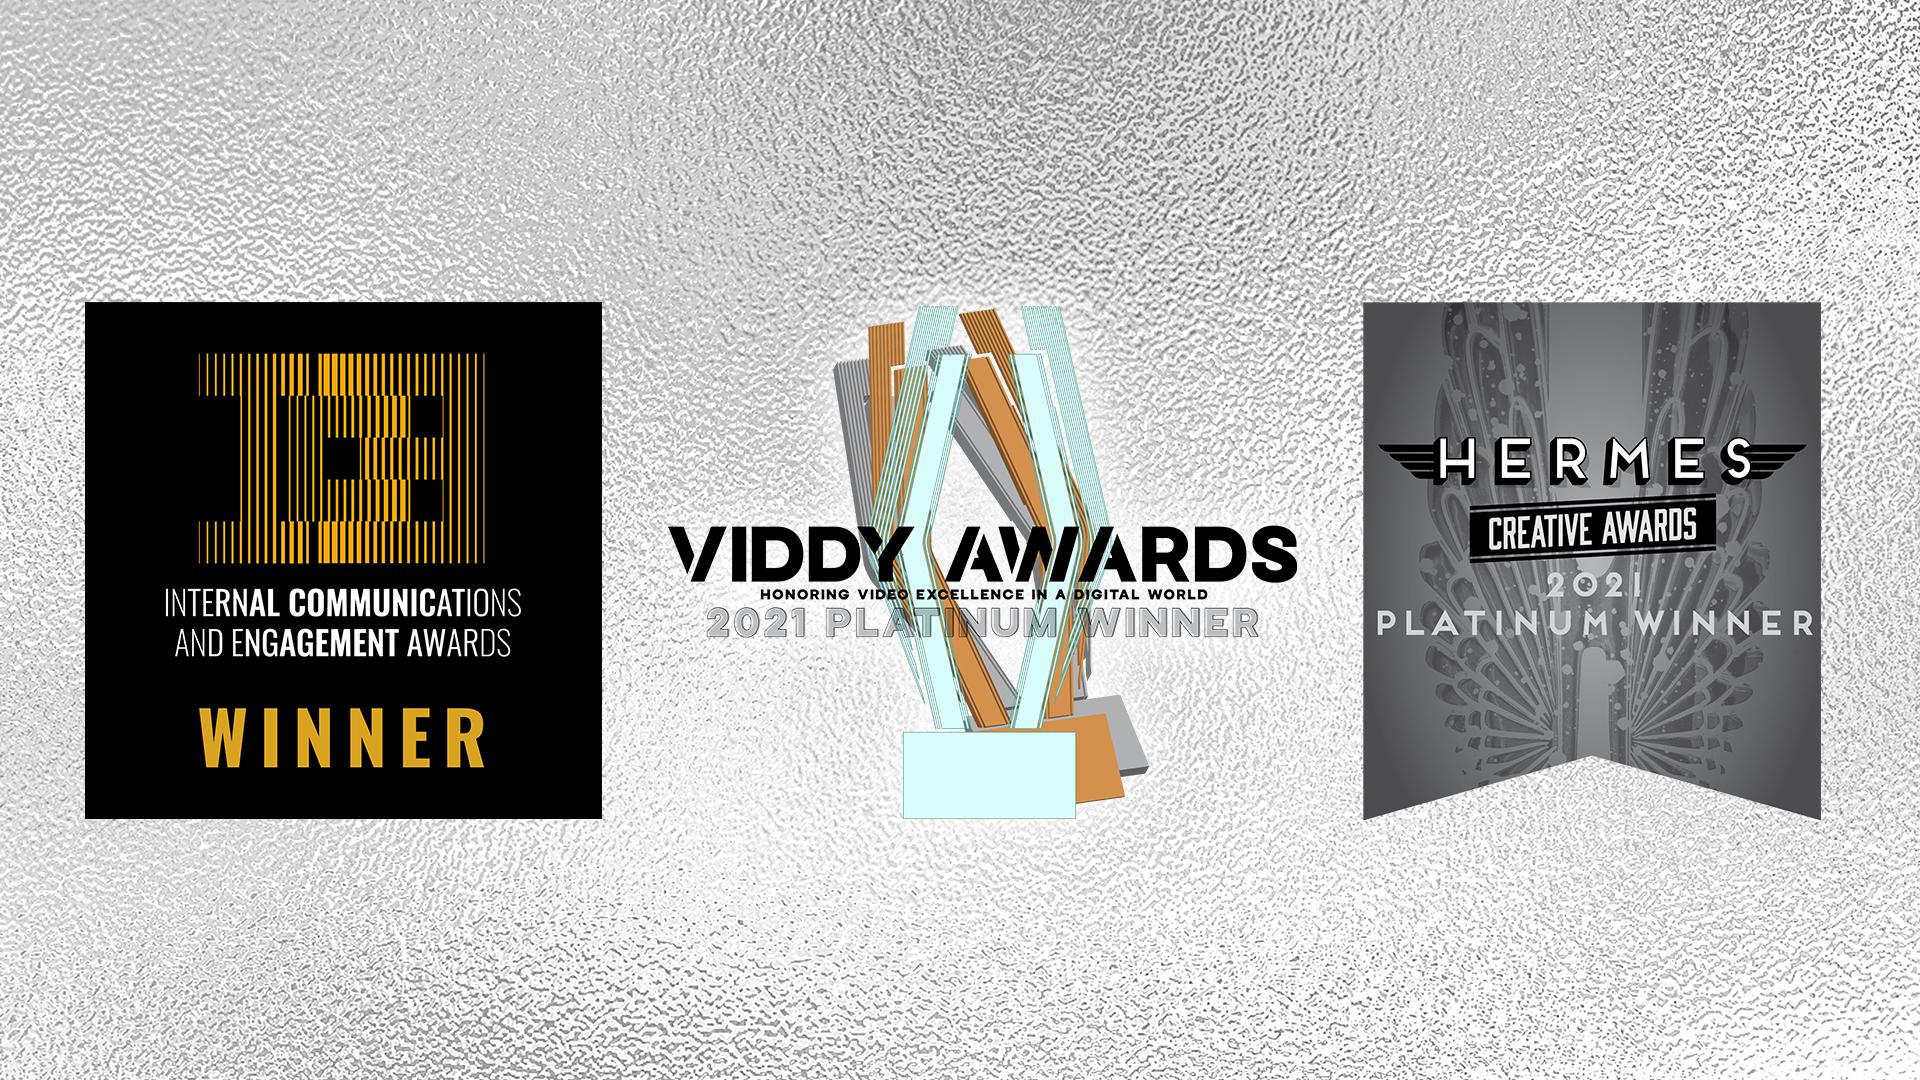 Harleys awards